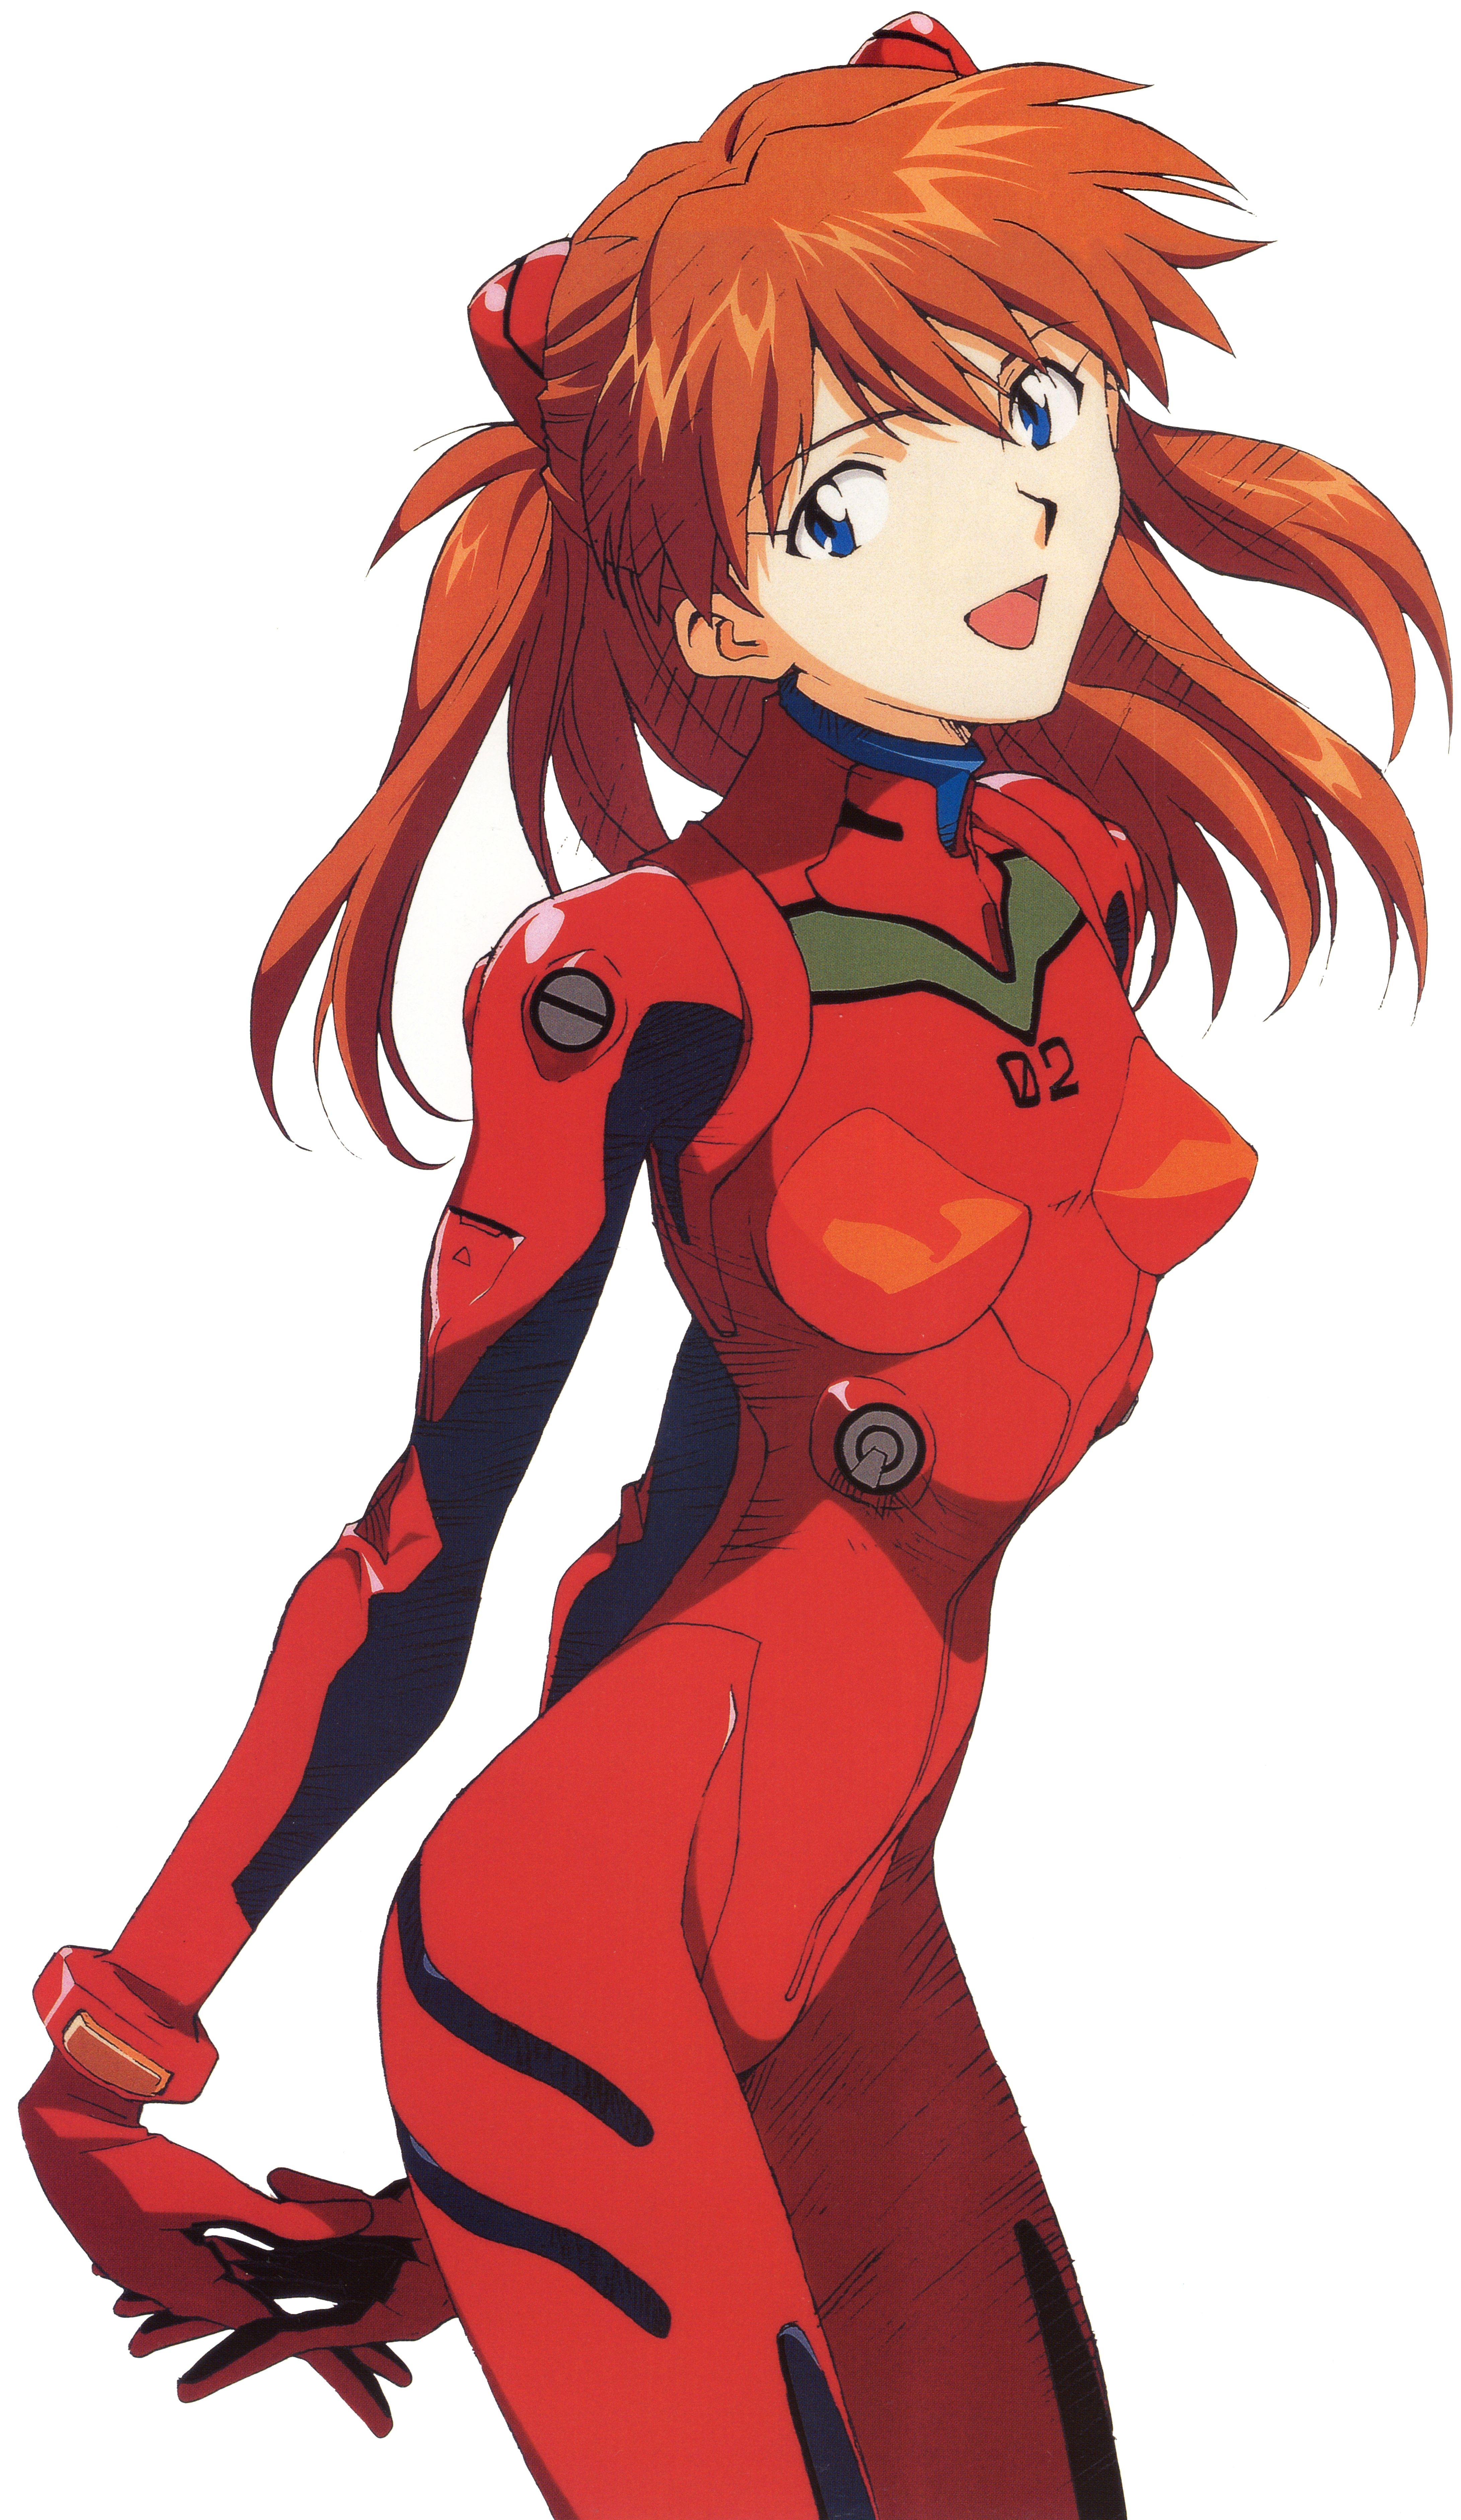 Anime picture neon genesis evangelion gainax soryu asuka langley rioom long hair single